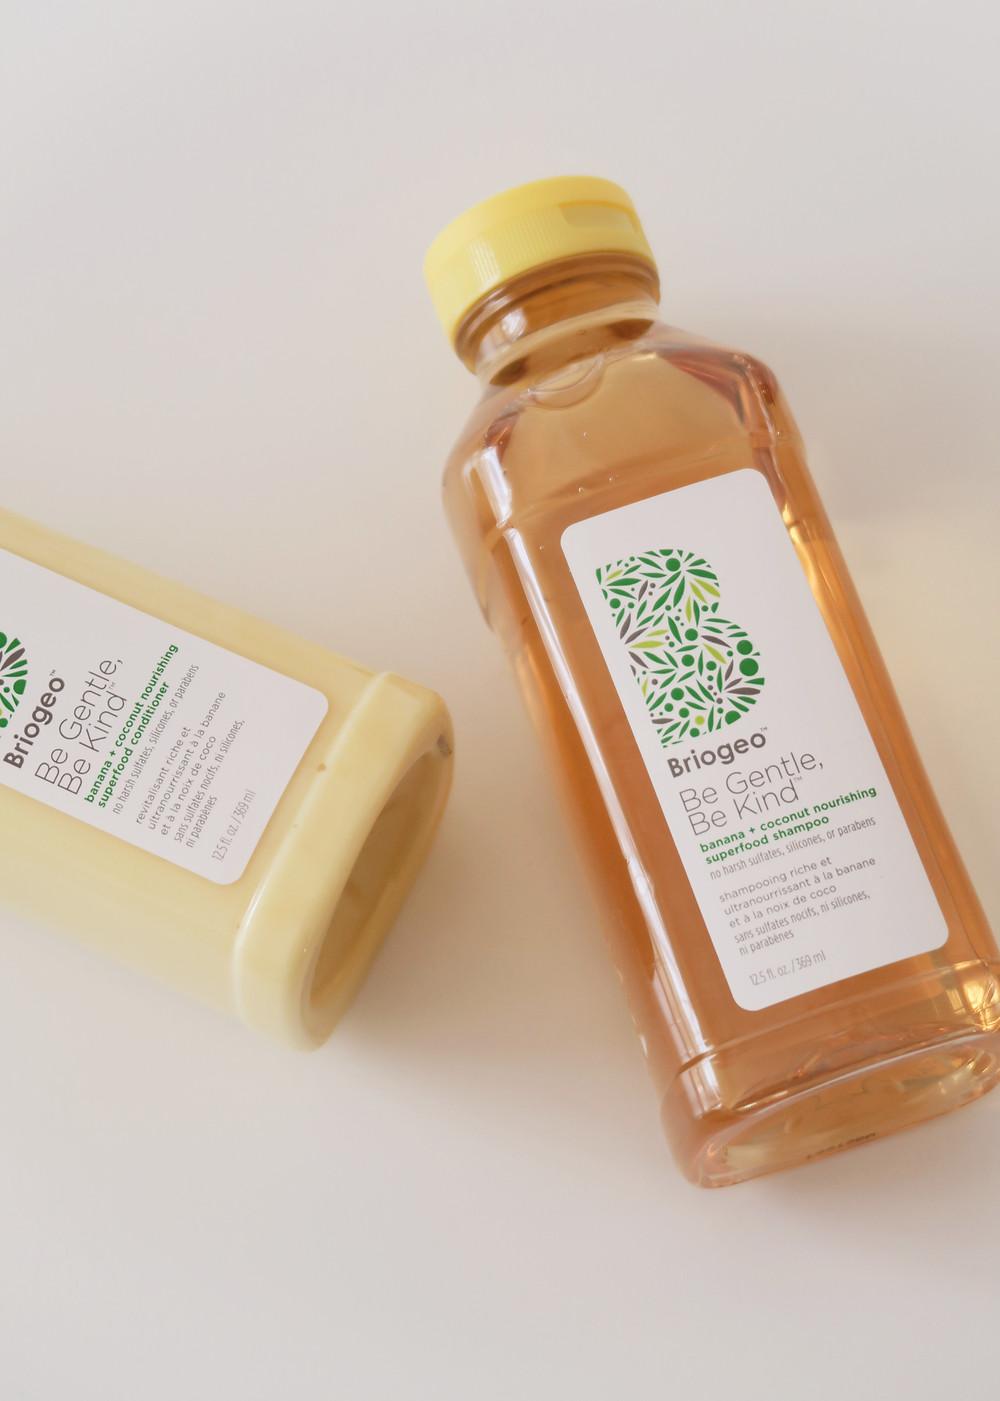 briogeo be gentle be kind banana coconut shampoo conditioner review